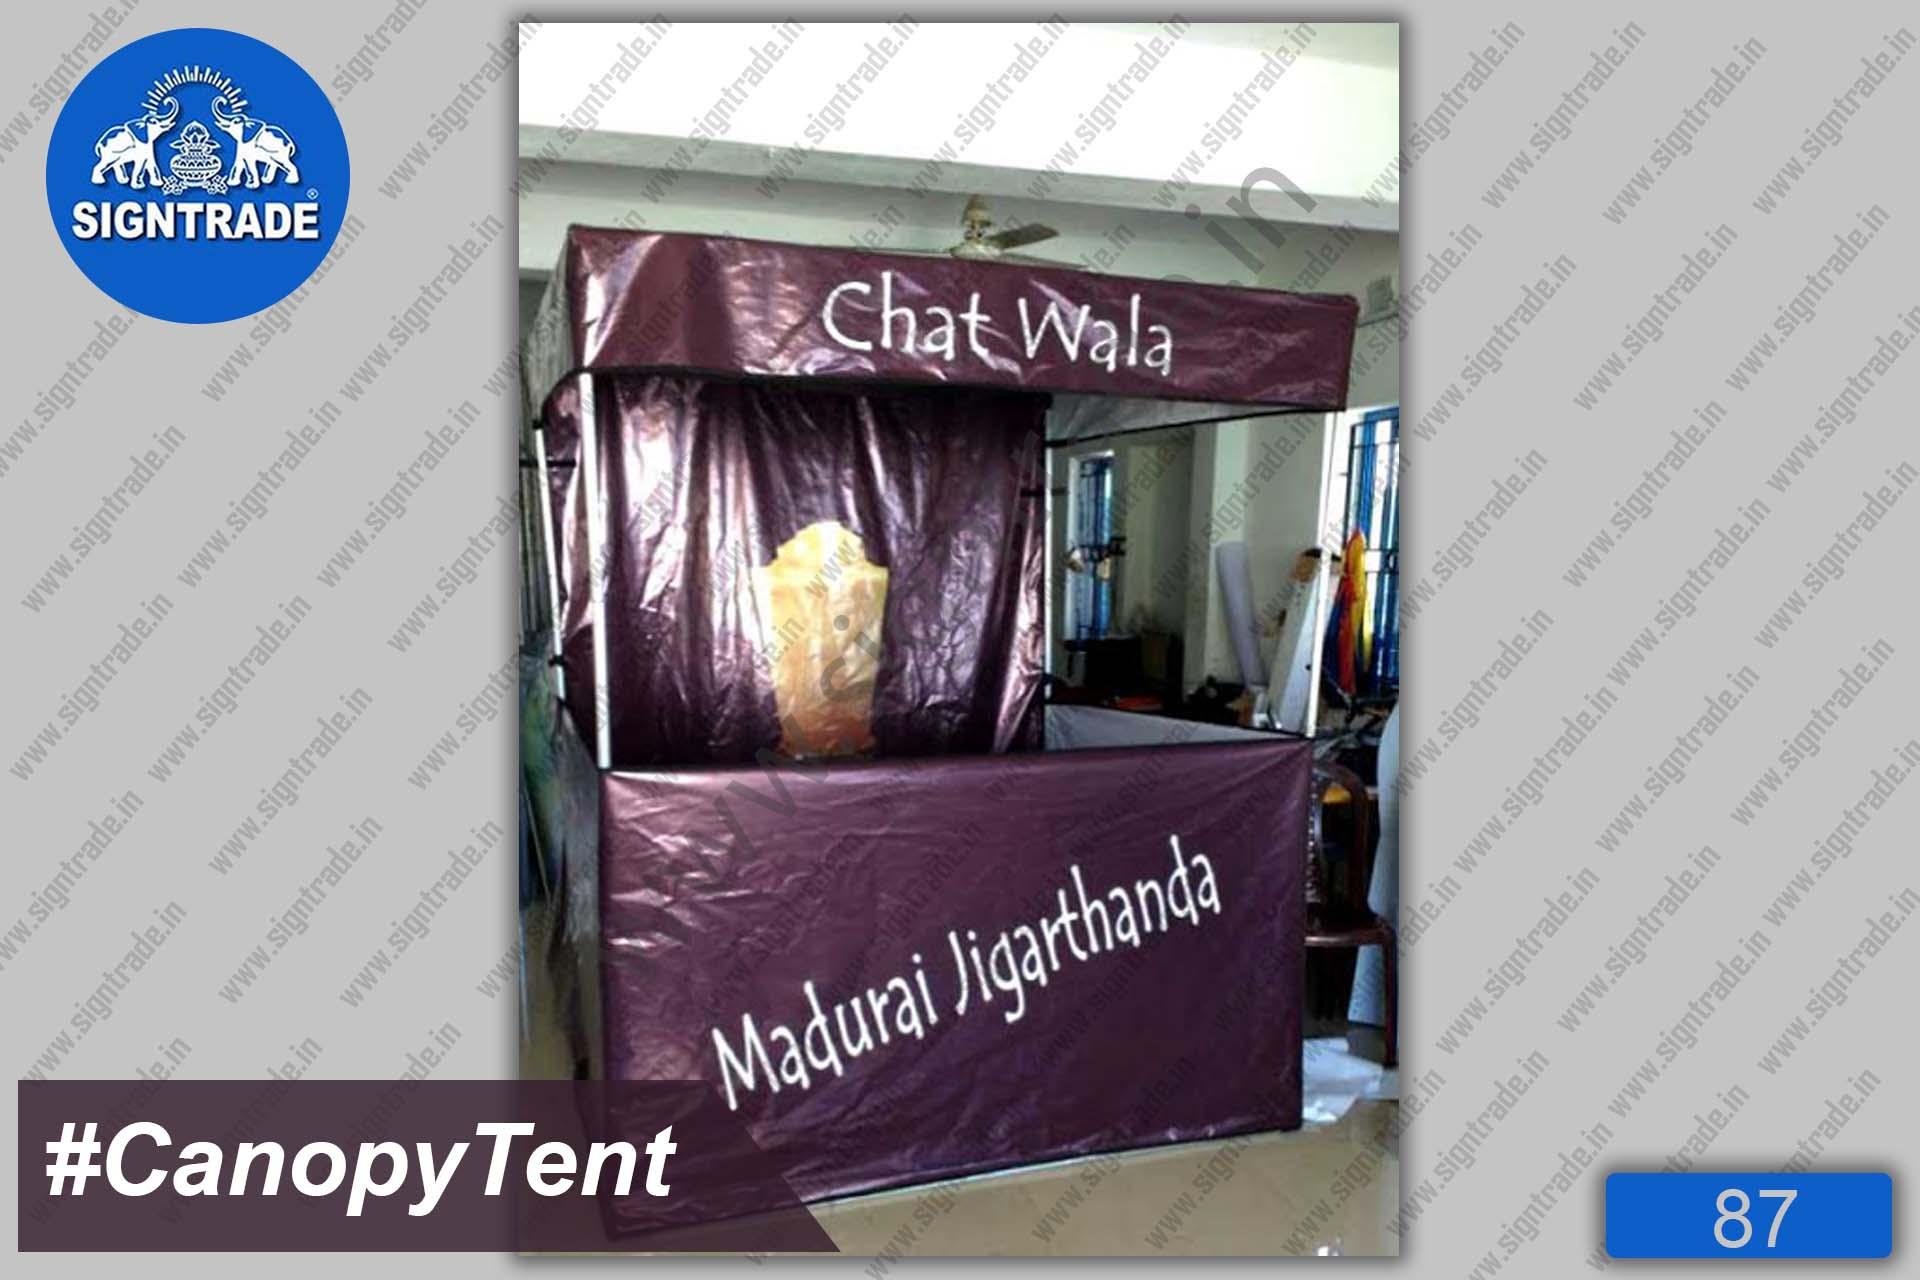 Flat Roof Tent, Canopy Tent - Chat Wala - Madurai Jigarthanda